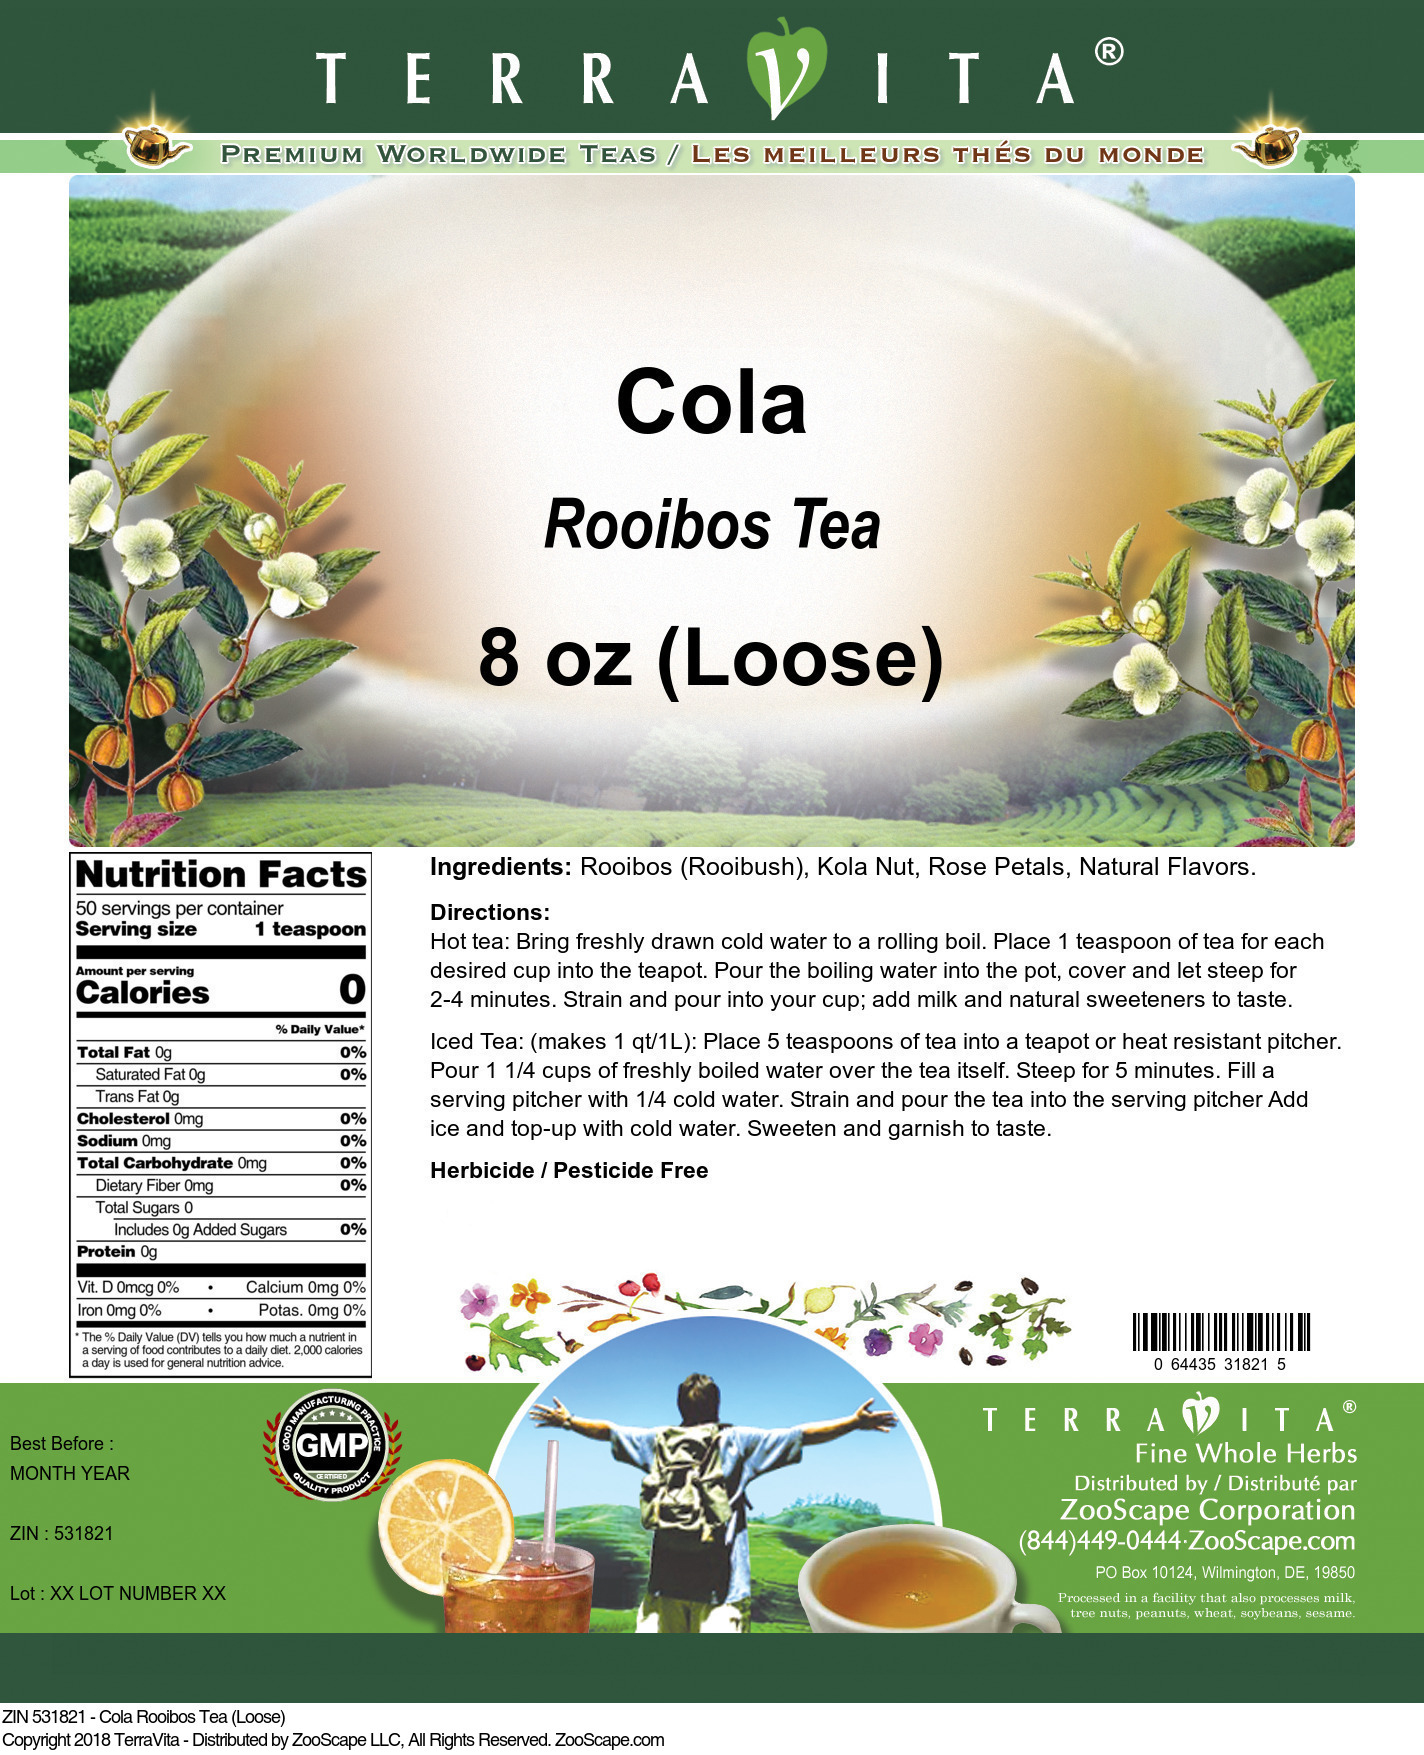 Cola Rooibos Tea (Loose)